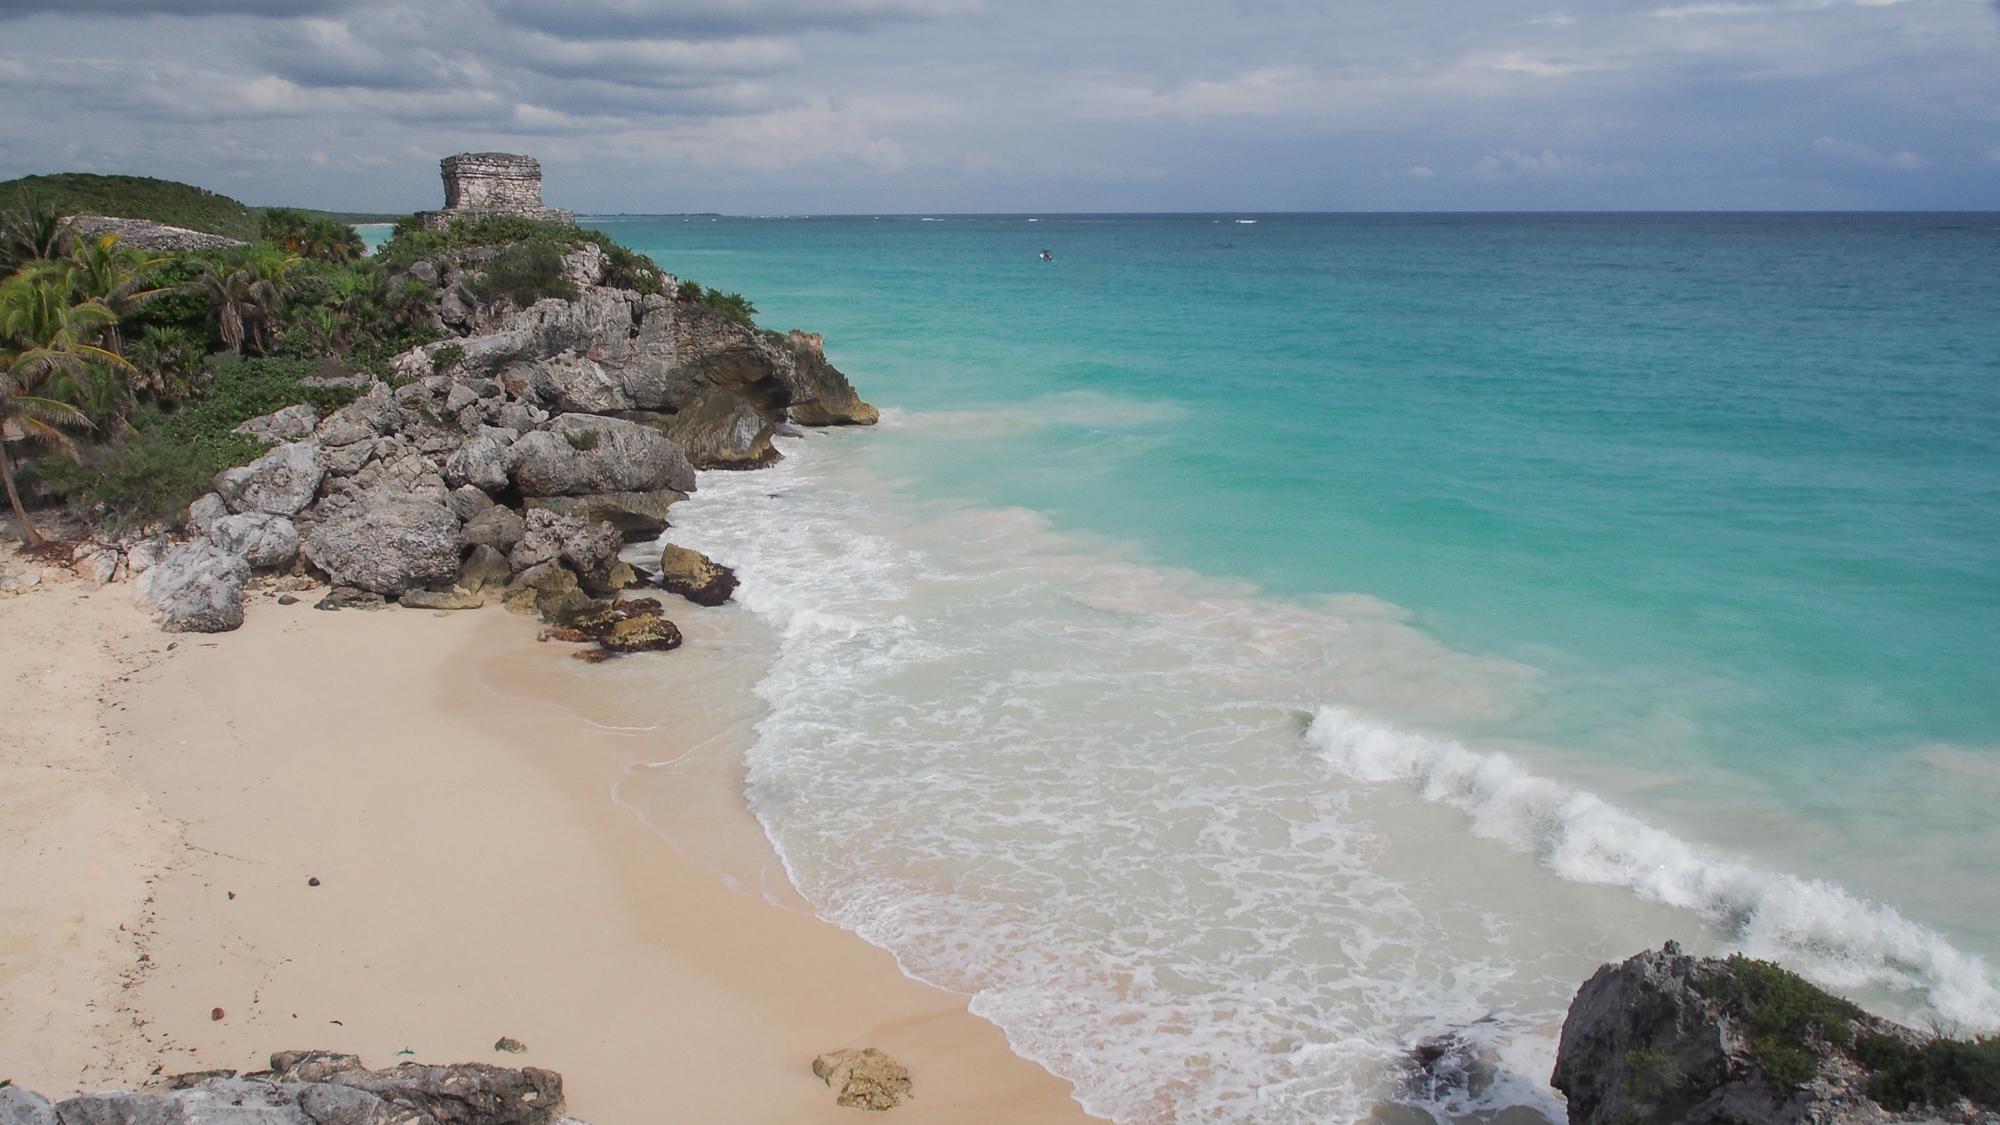 Tulum, beach and castle, Mexico